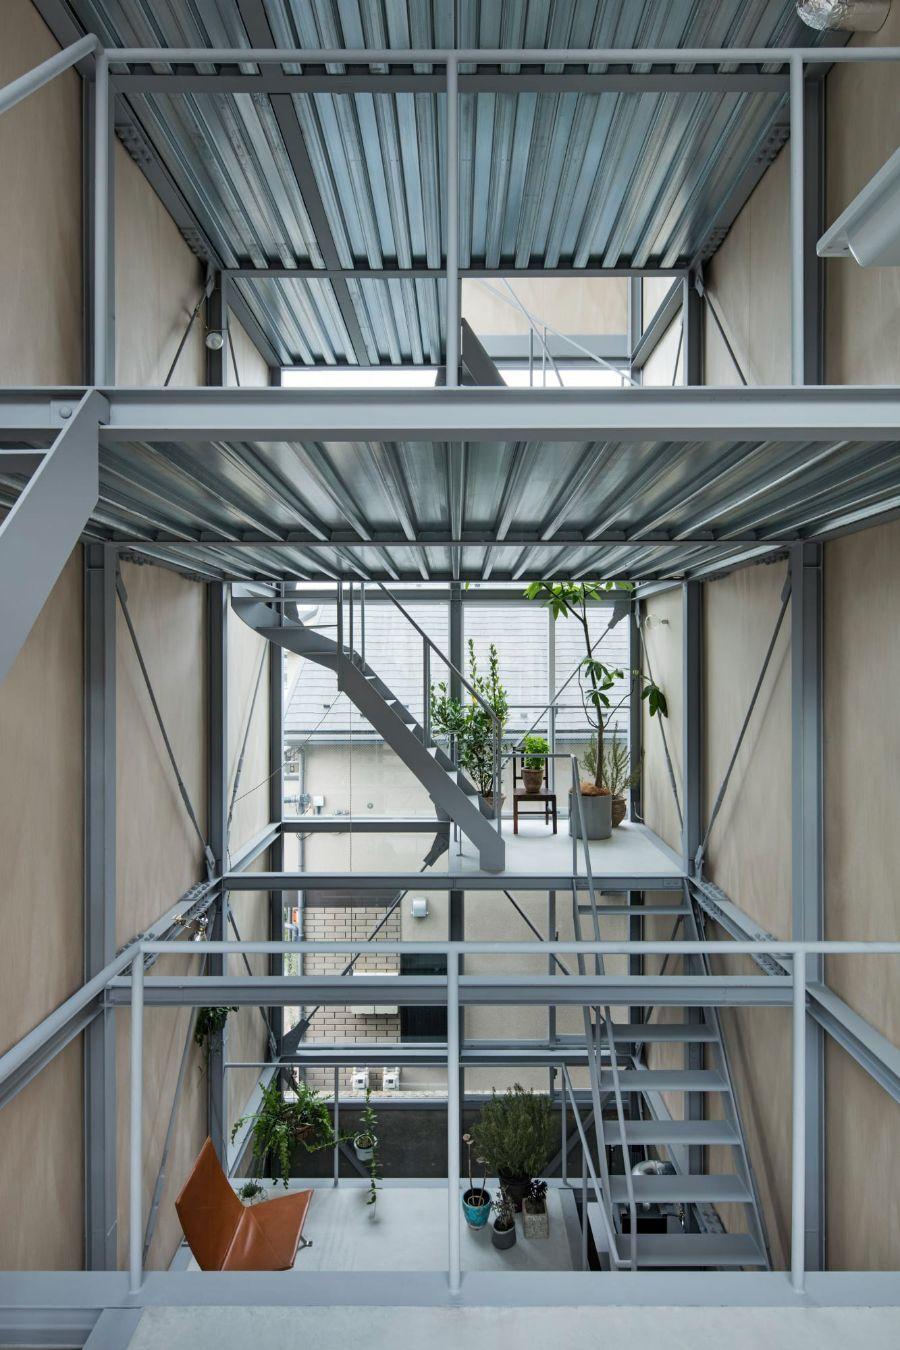 Ebisu No Ie by Tetsuo Yamaji Architects